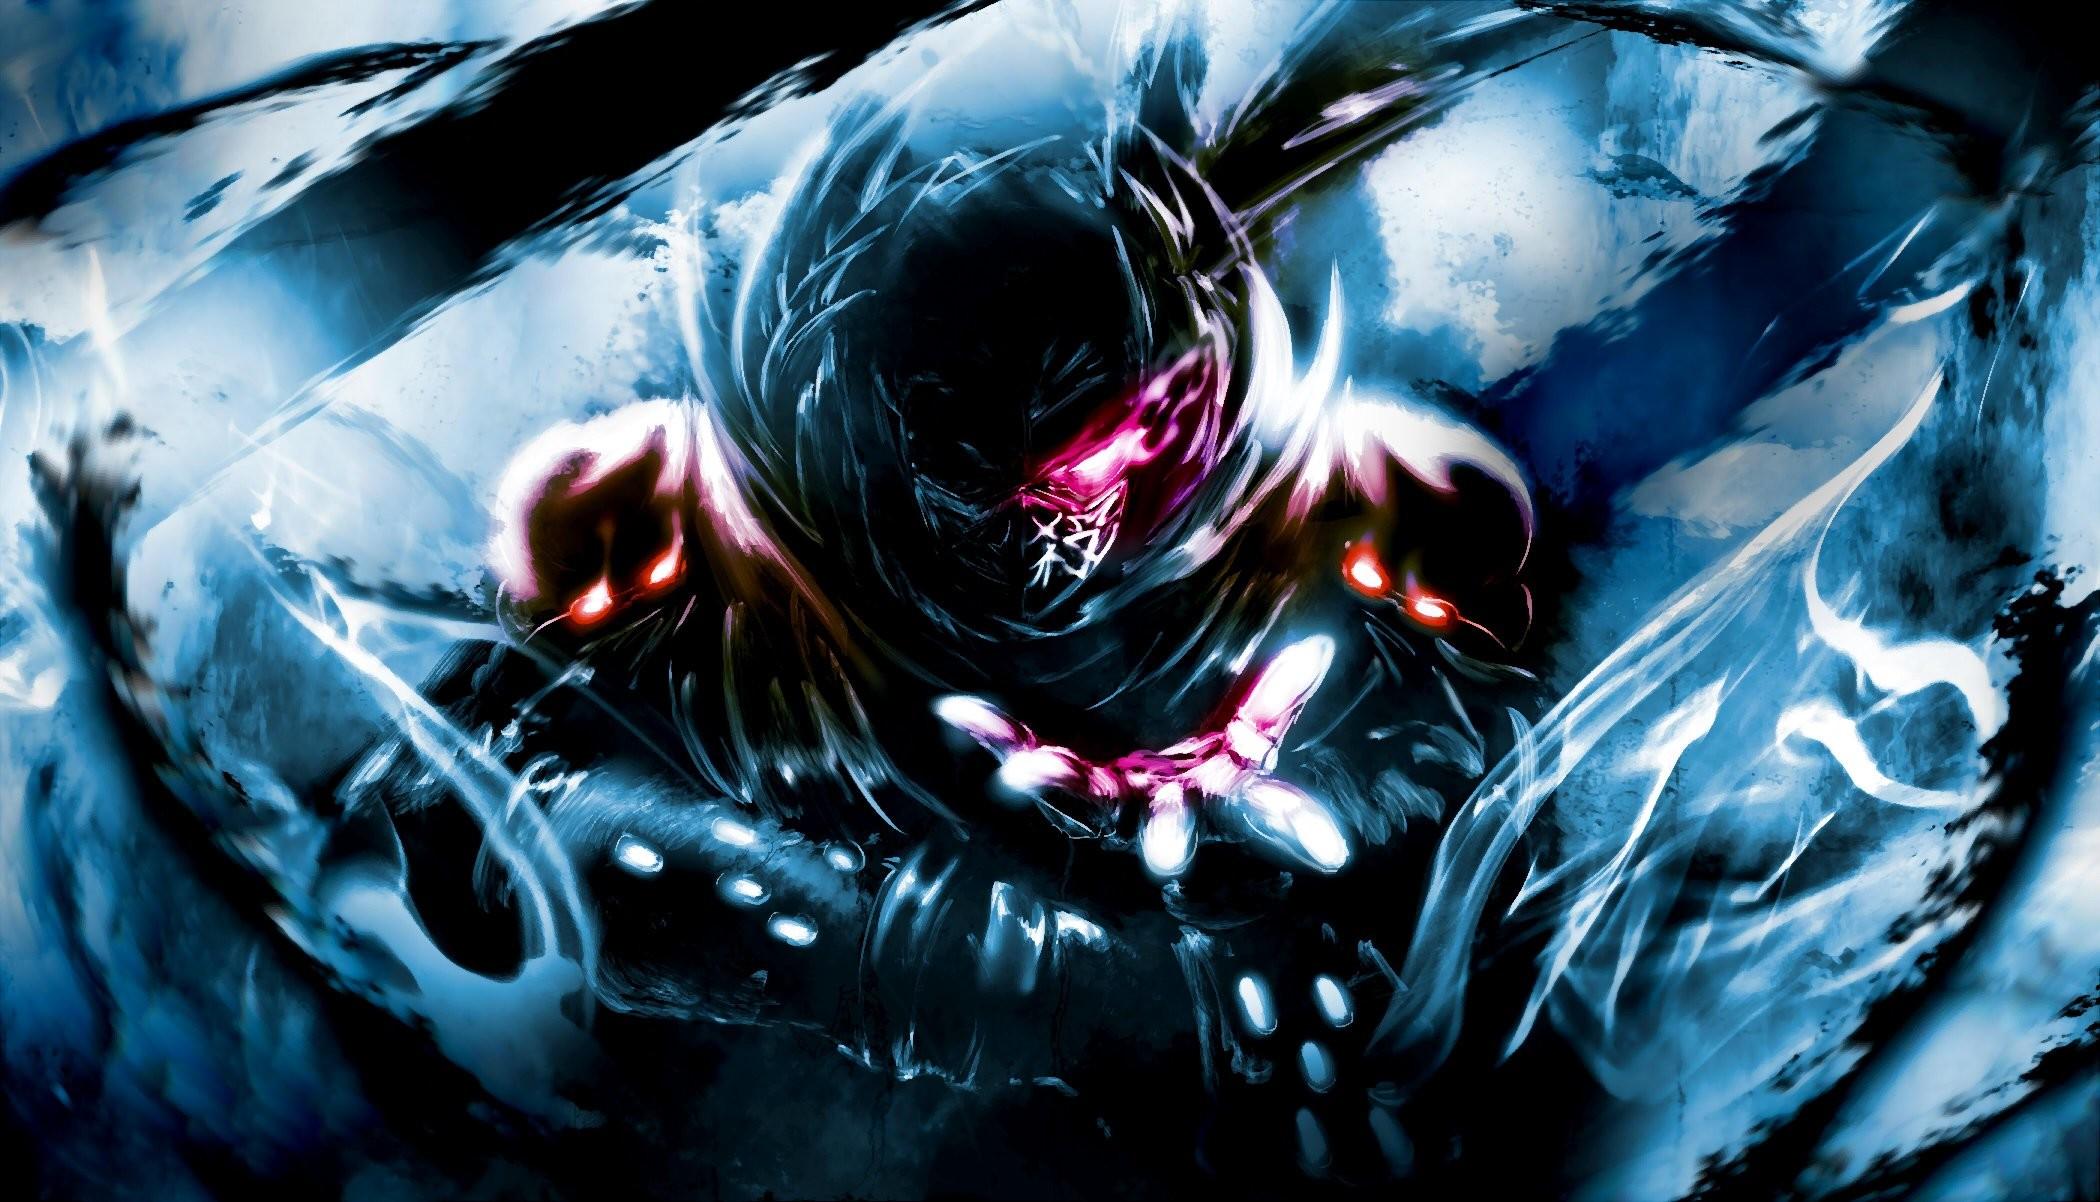 NINJA SLAYER Ninjasureiya sci-fi cyberpunk fighting animation anime  1nslayer warrior wallpaper     624673   WallpaperUP